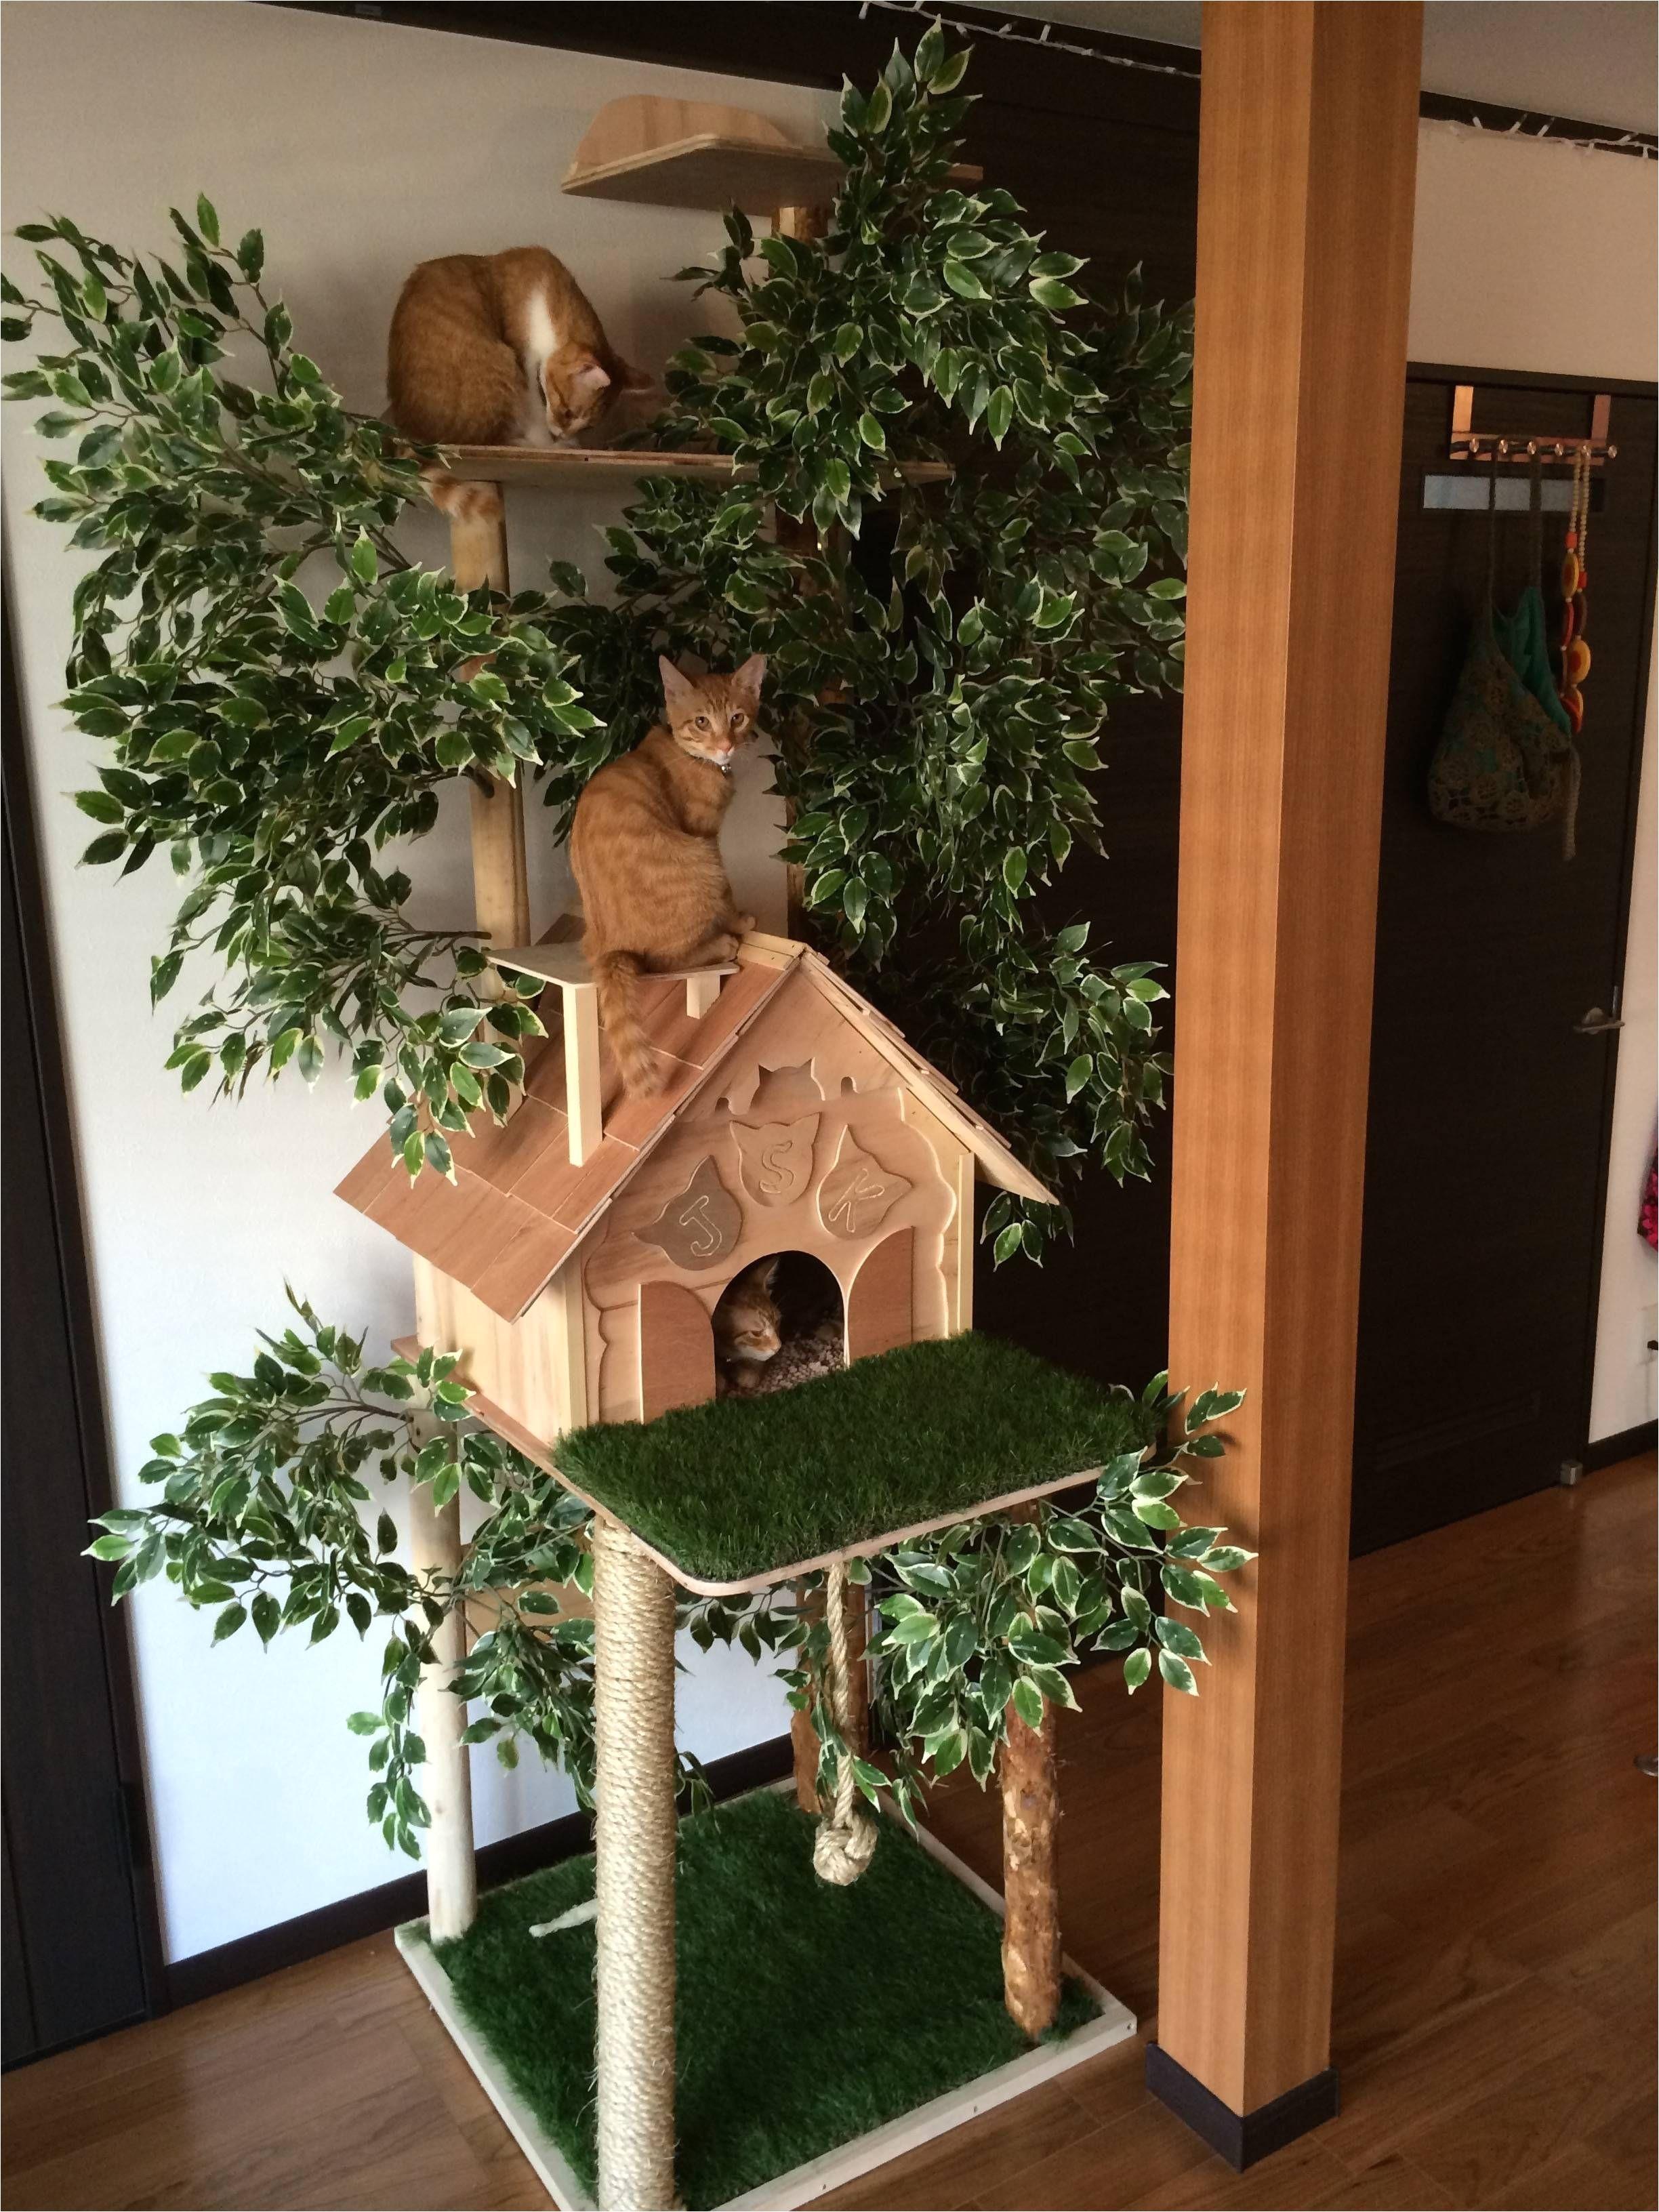 od about gebrichmond cat house plans cat house design diy luxury cat house plans custom house plans best